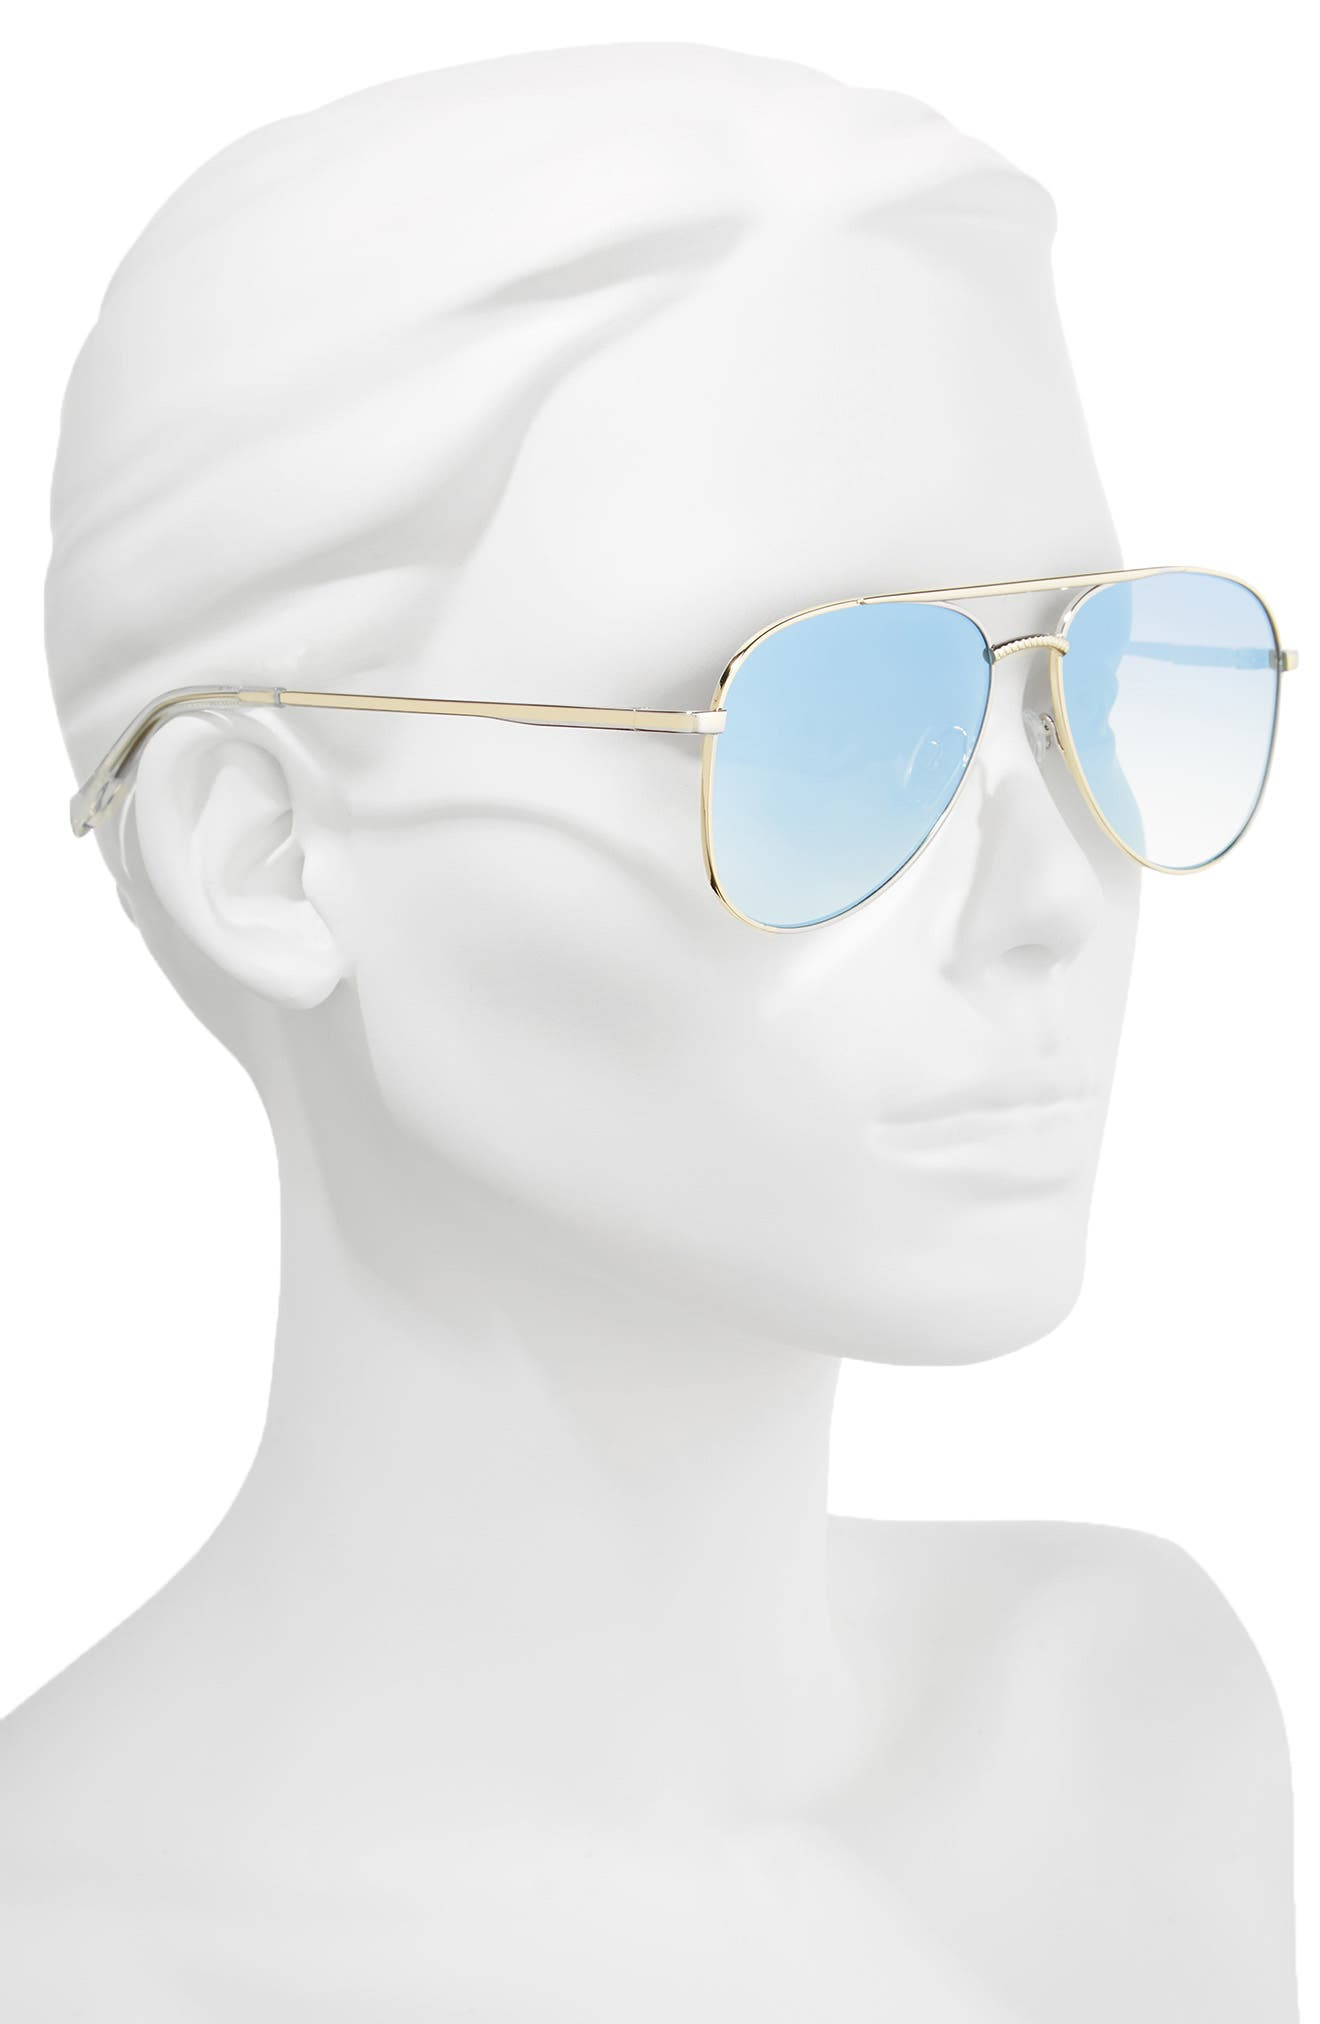 Kingdom 57mm Polarized Aviator Sunglasses,                             Alternate thumbnail 2, color,                             Bright Gold